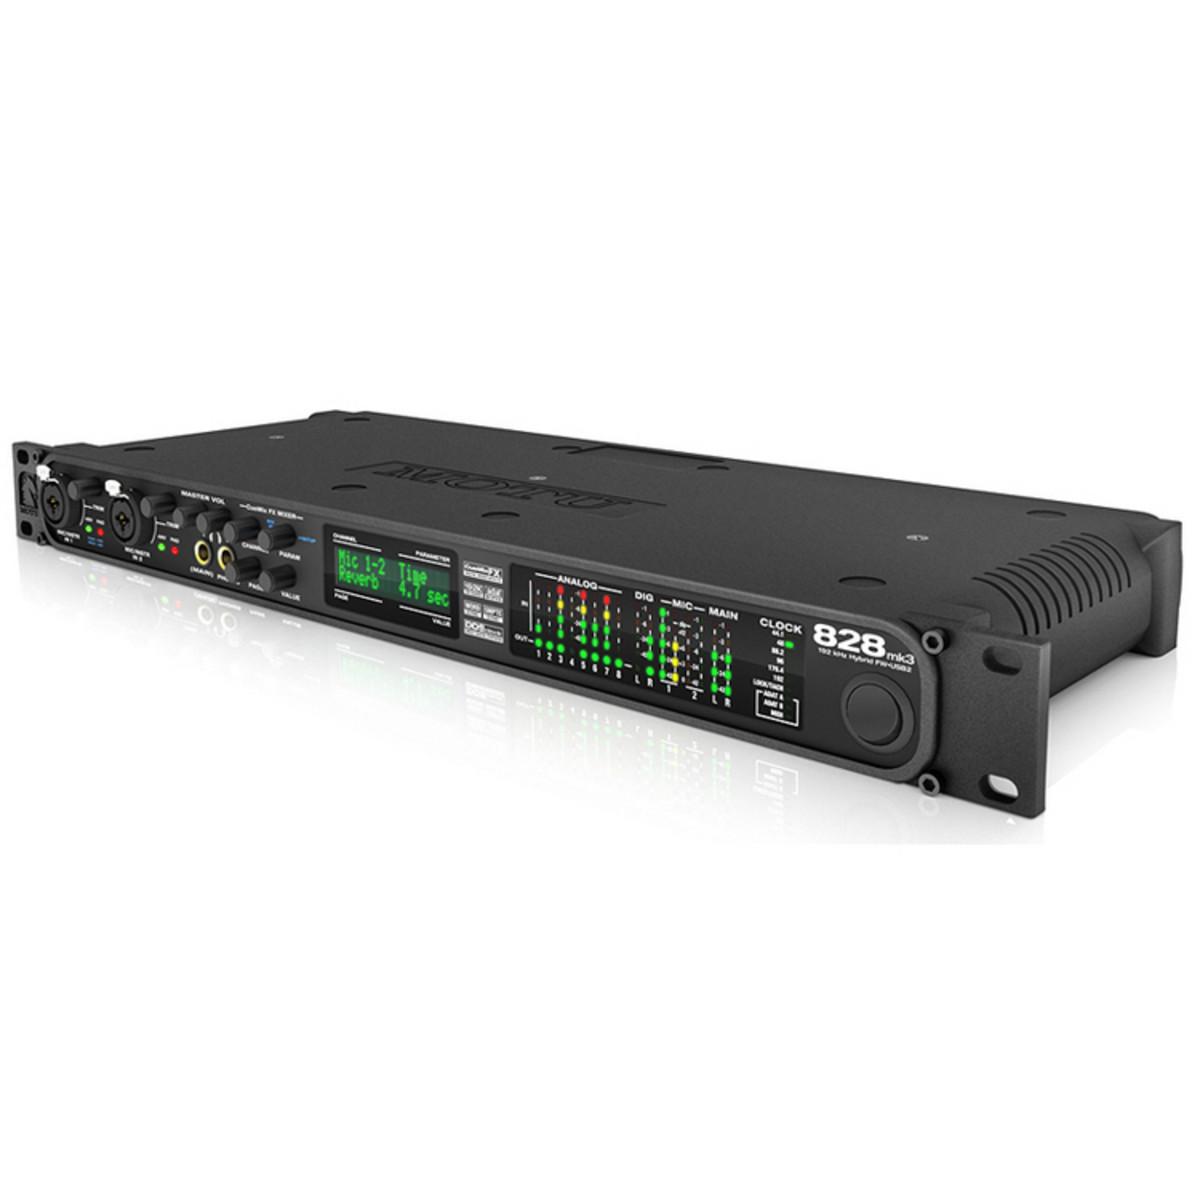 Motu 828 Mk3 Hybrid Firewire Usb Audio Interface